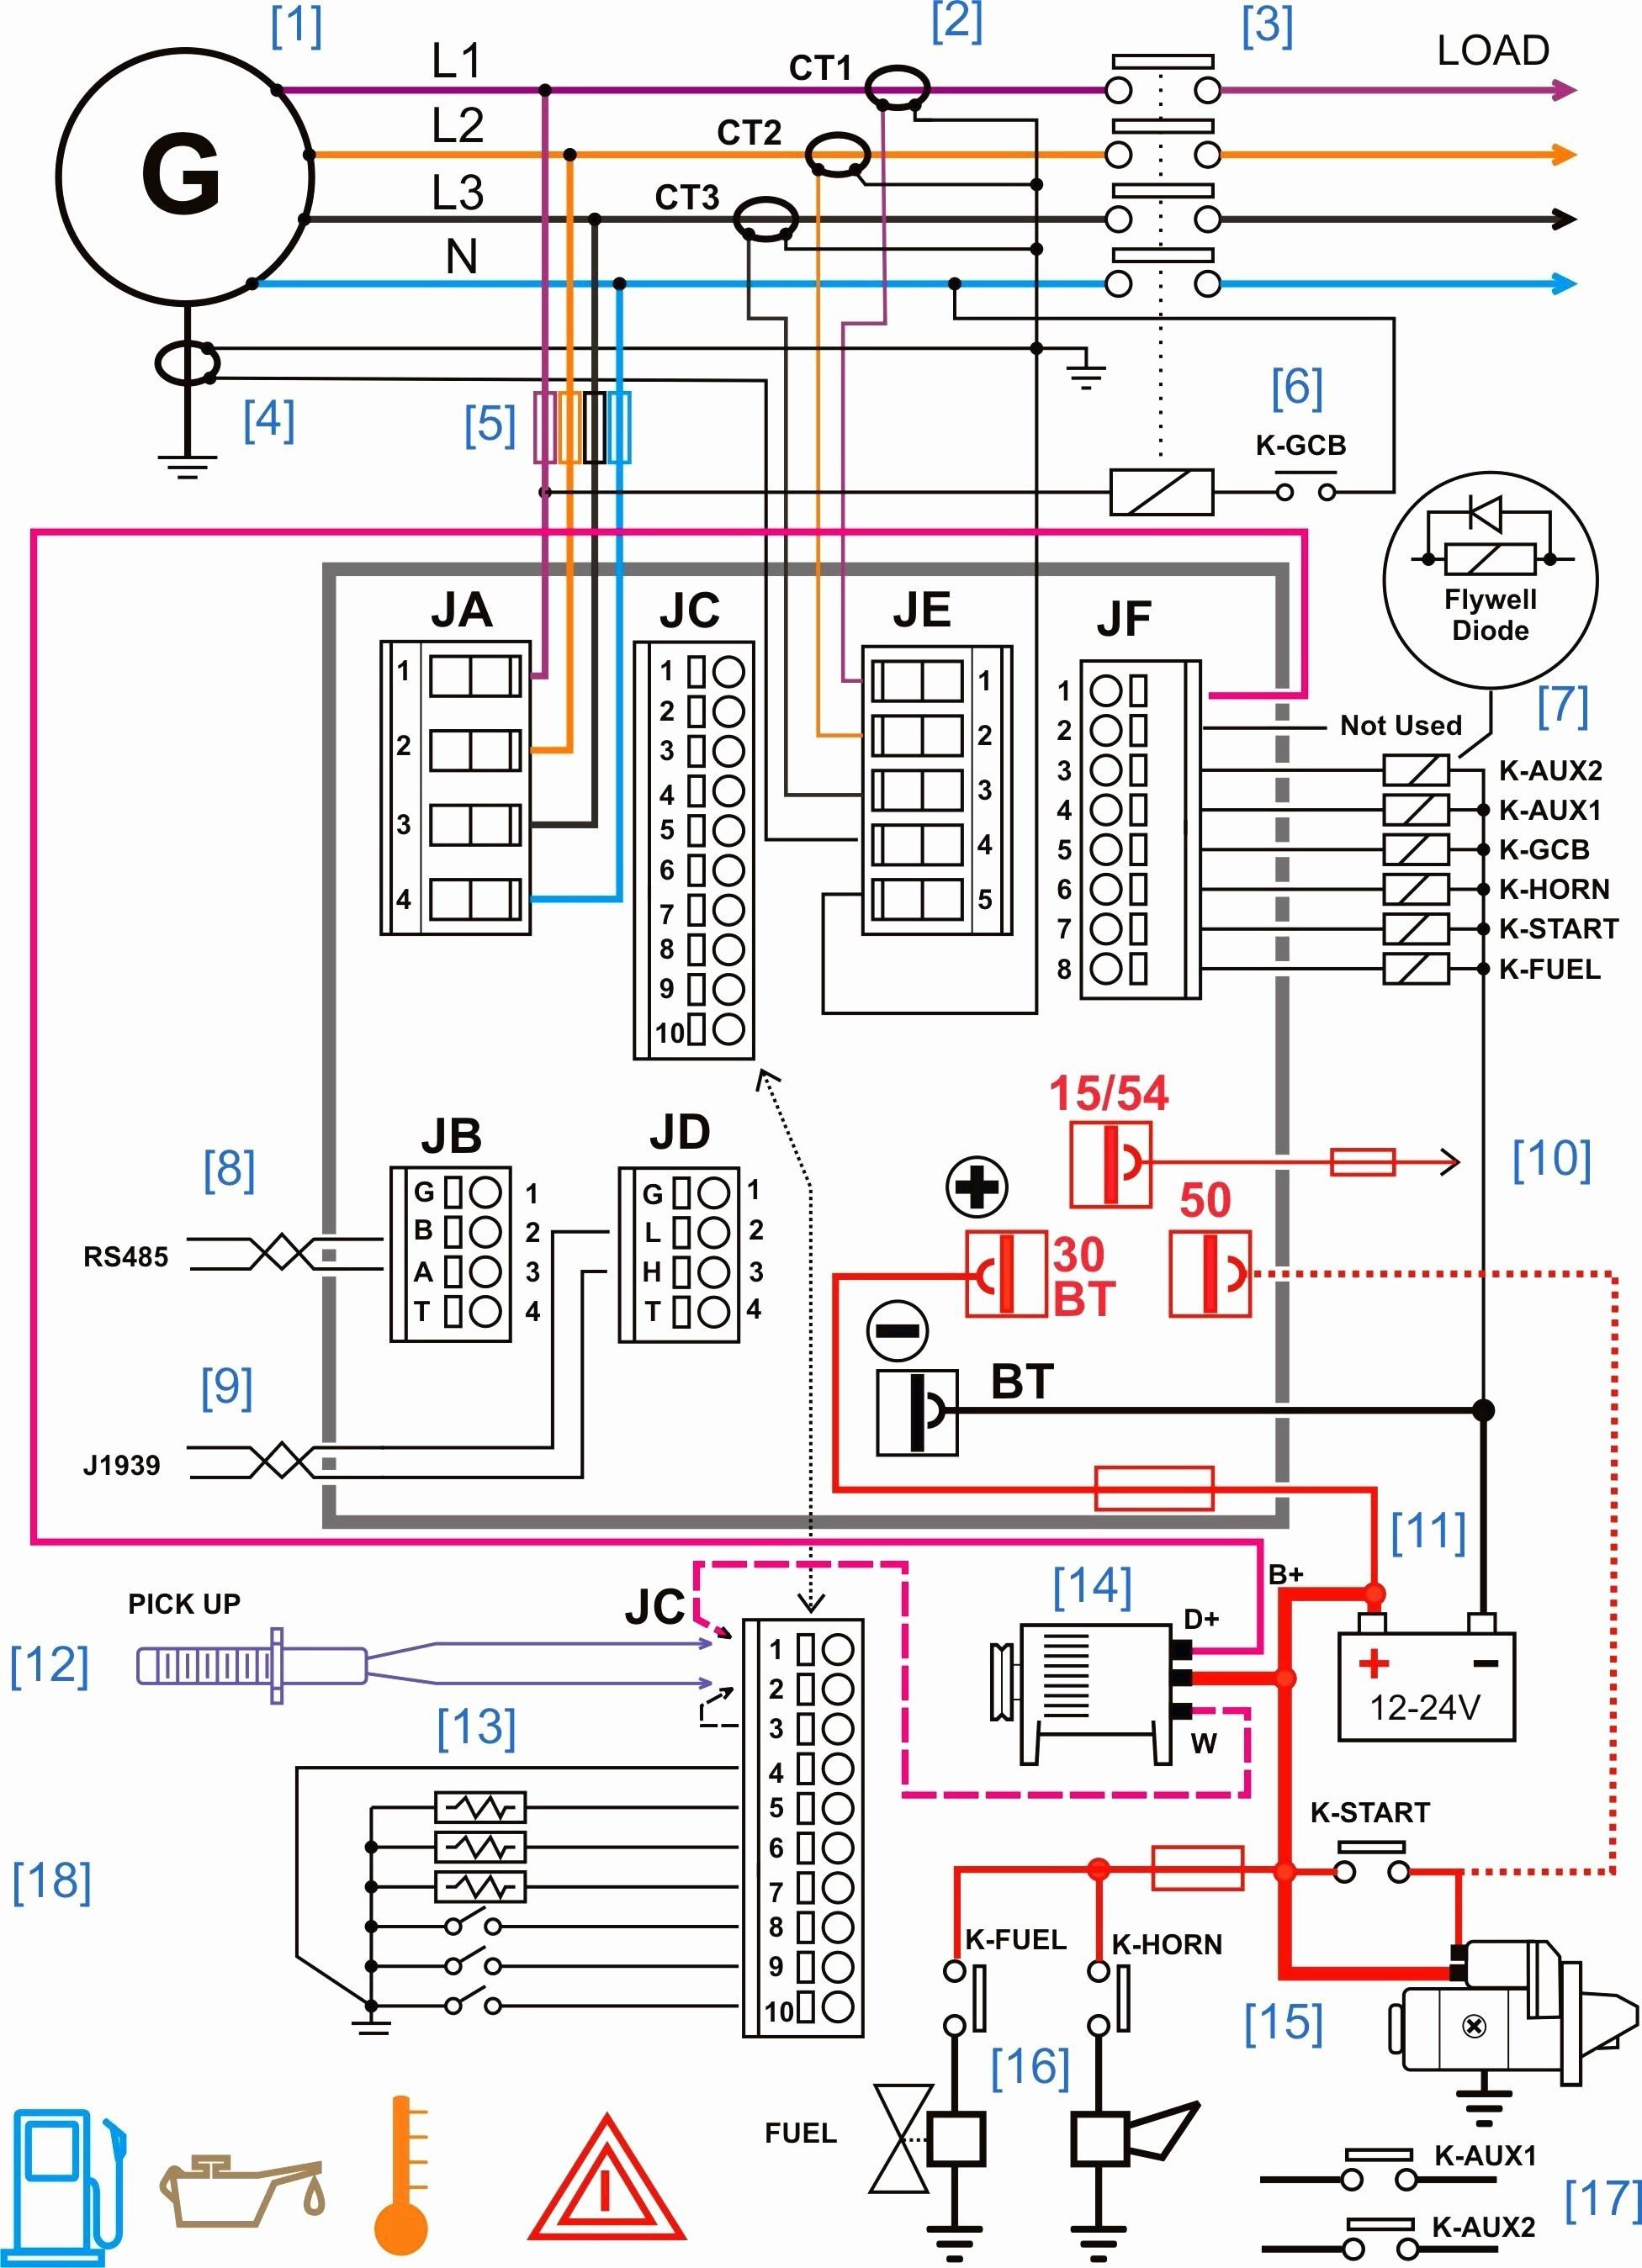 Basic House Wiring Diagram Australia Refrence Automotive Wiring Diagram Line Save Best Wiring Diagram Od Rv